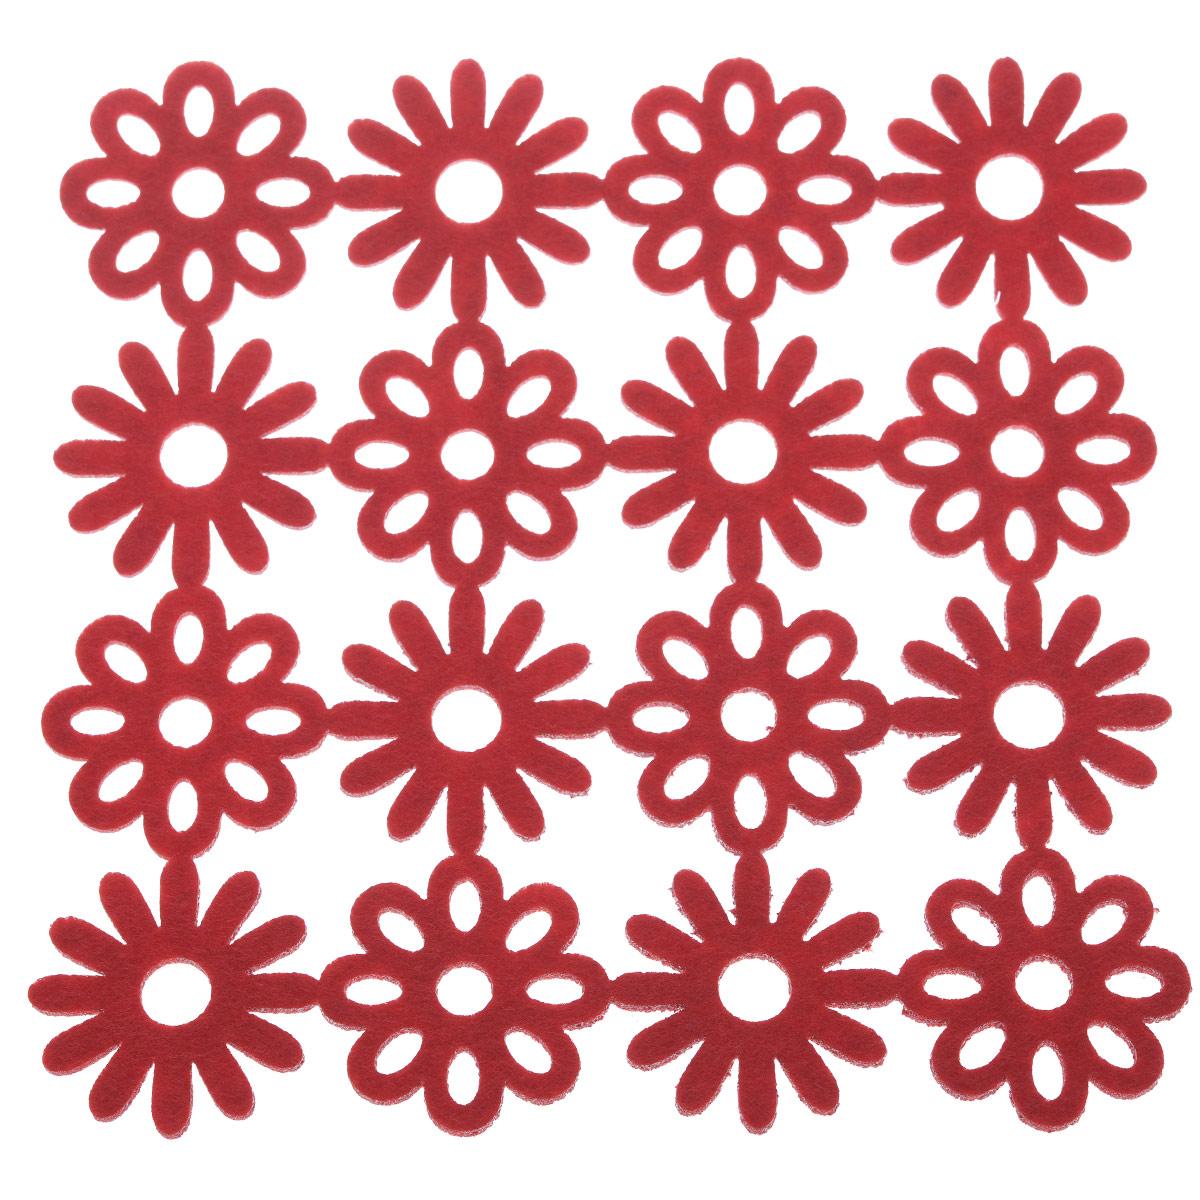 Салфетка-подставка Orange, квадратная, цвет: красный, 20 х 20 см